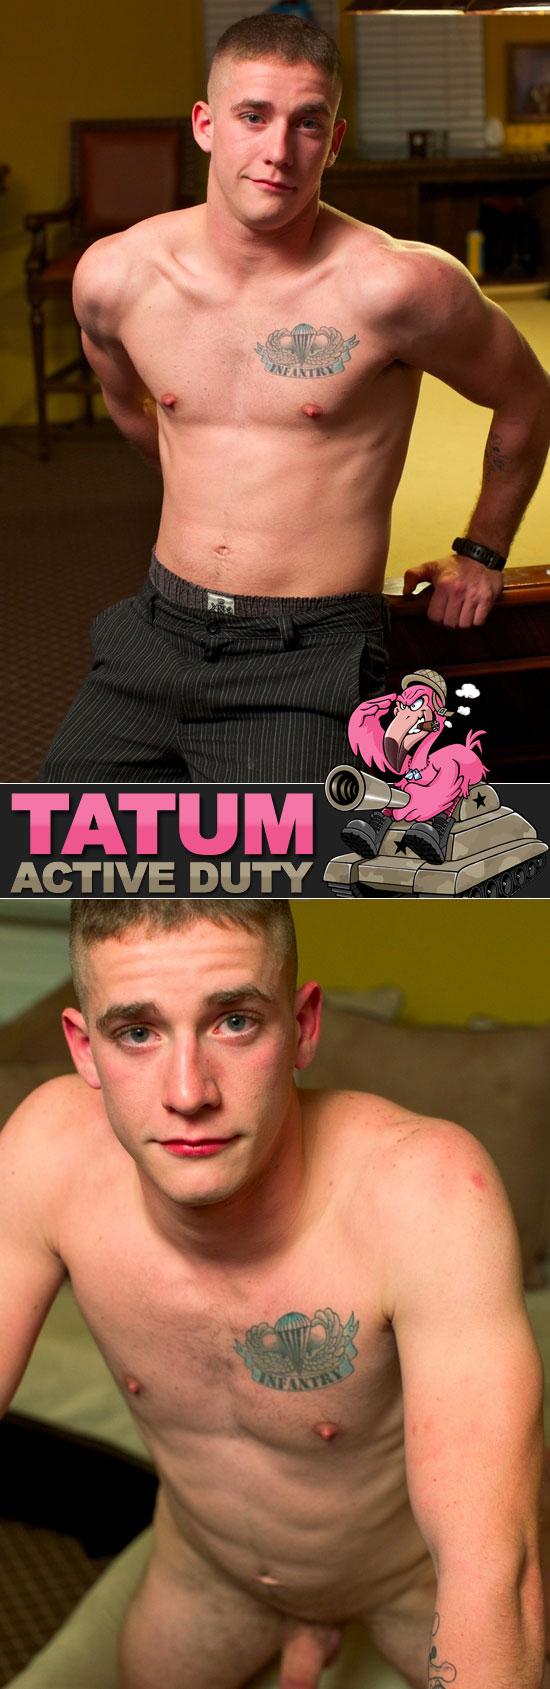 straight military guy